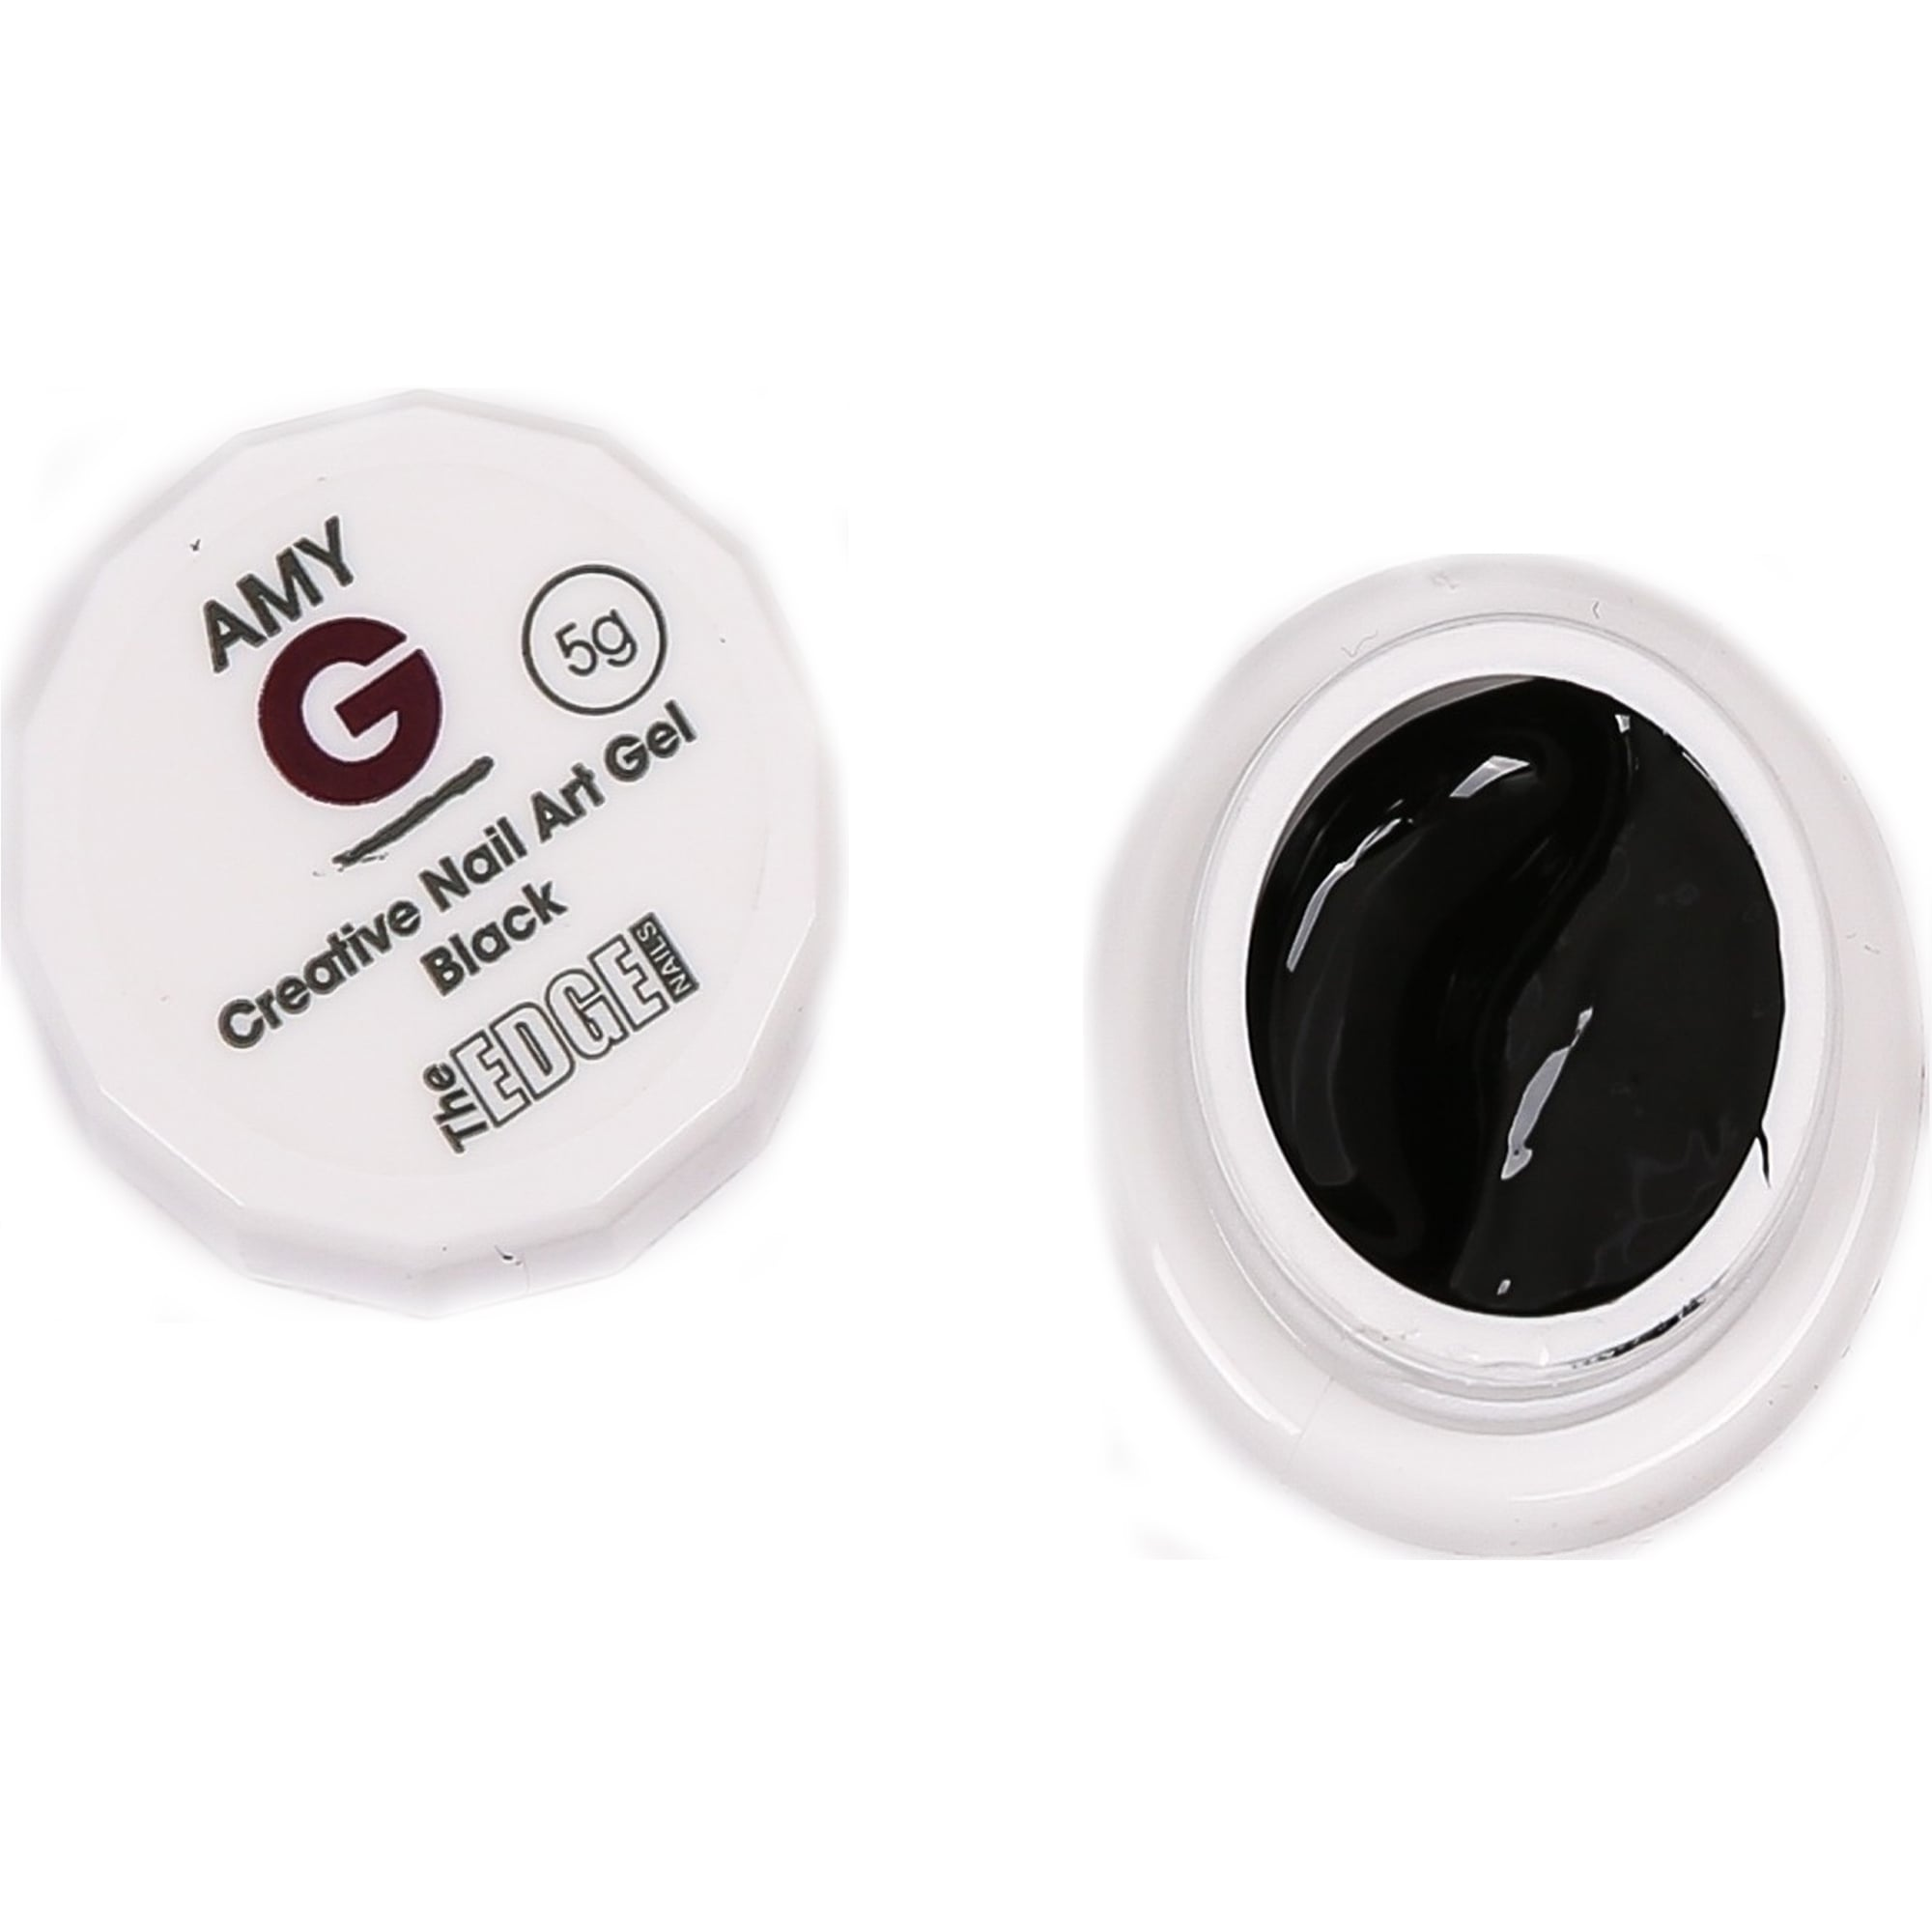 Amy G - Creative Nail Art Gel - Black 5g (3003039)